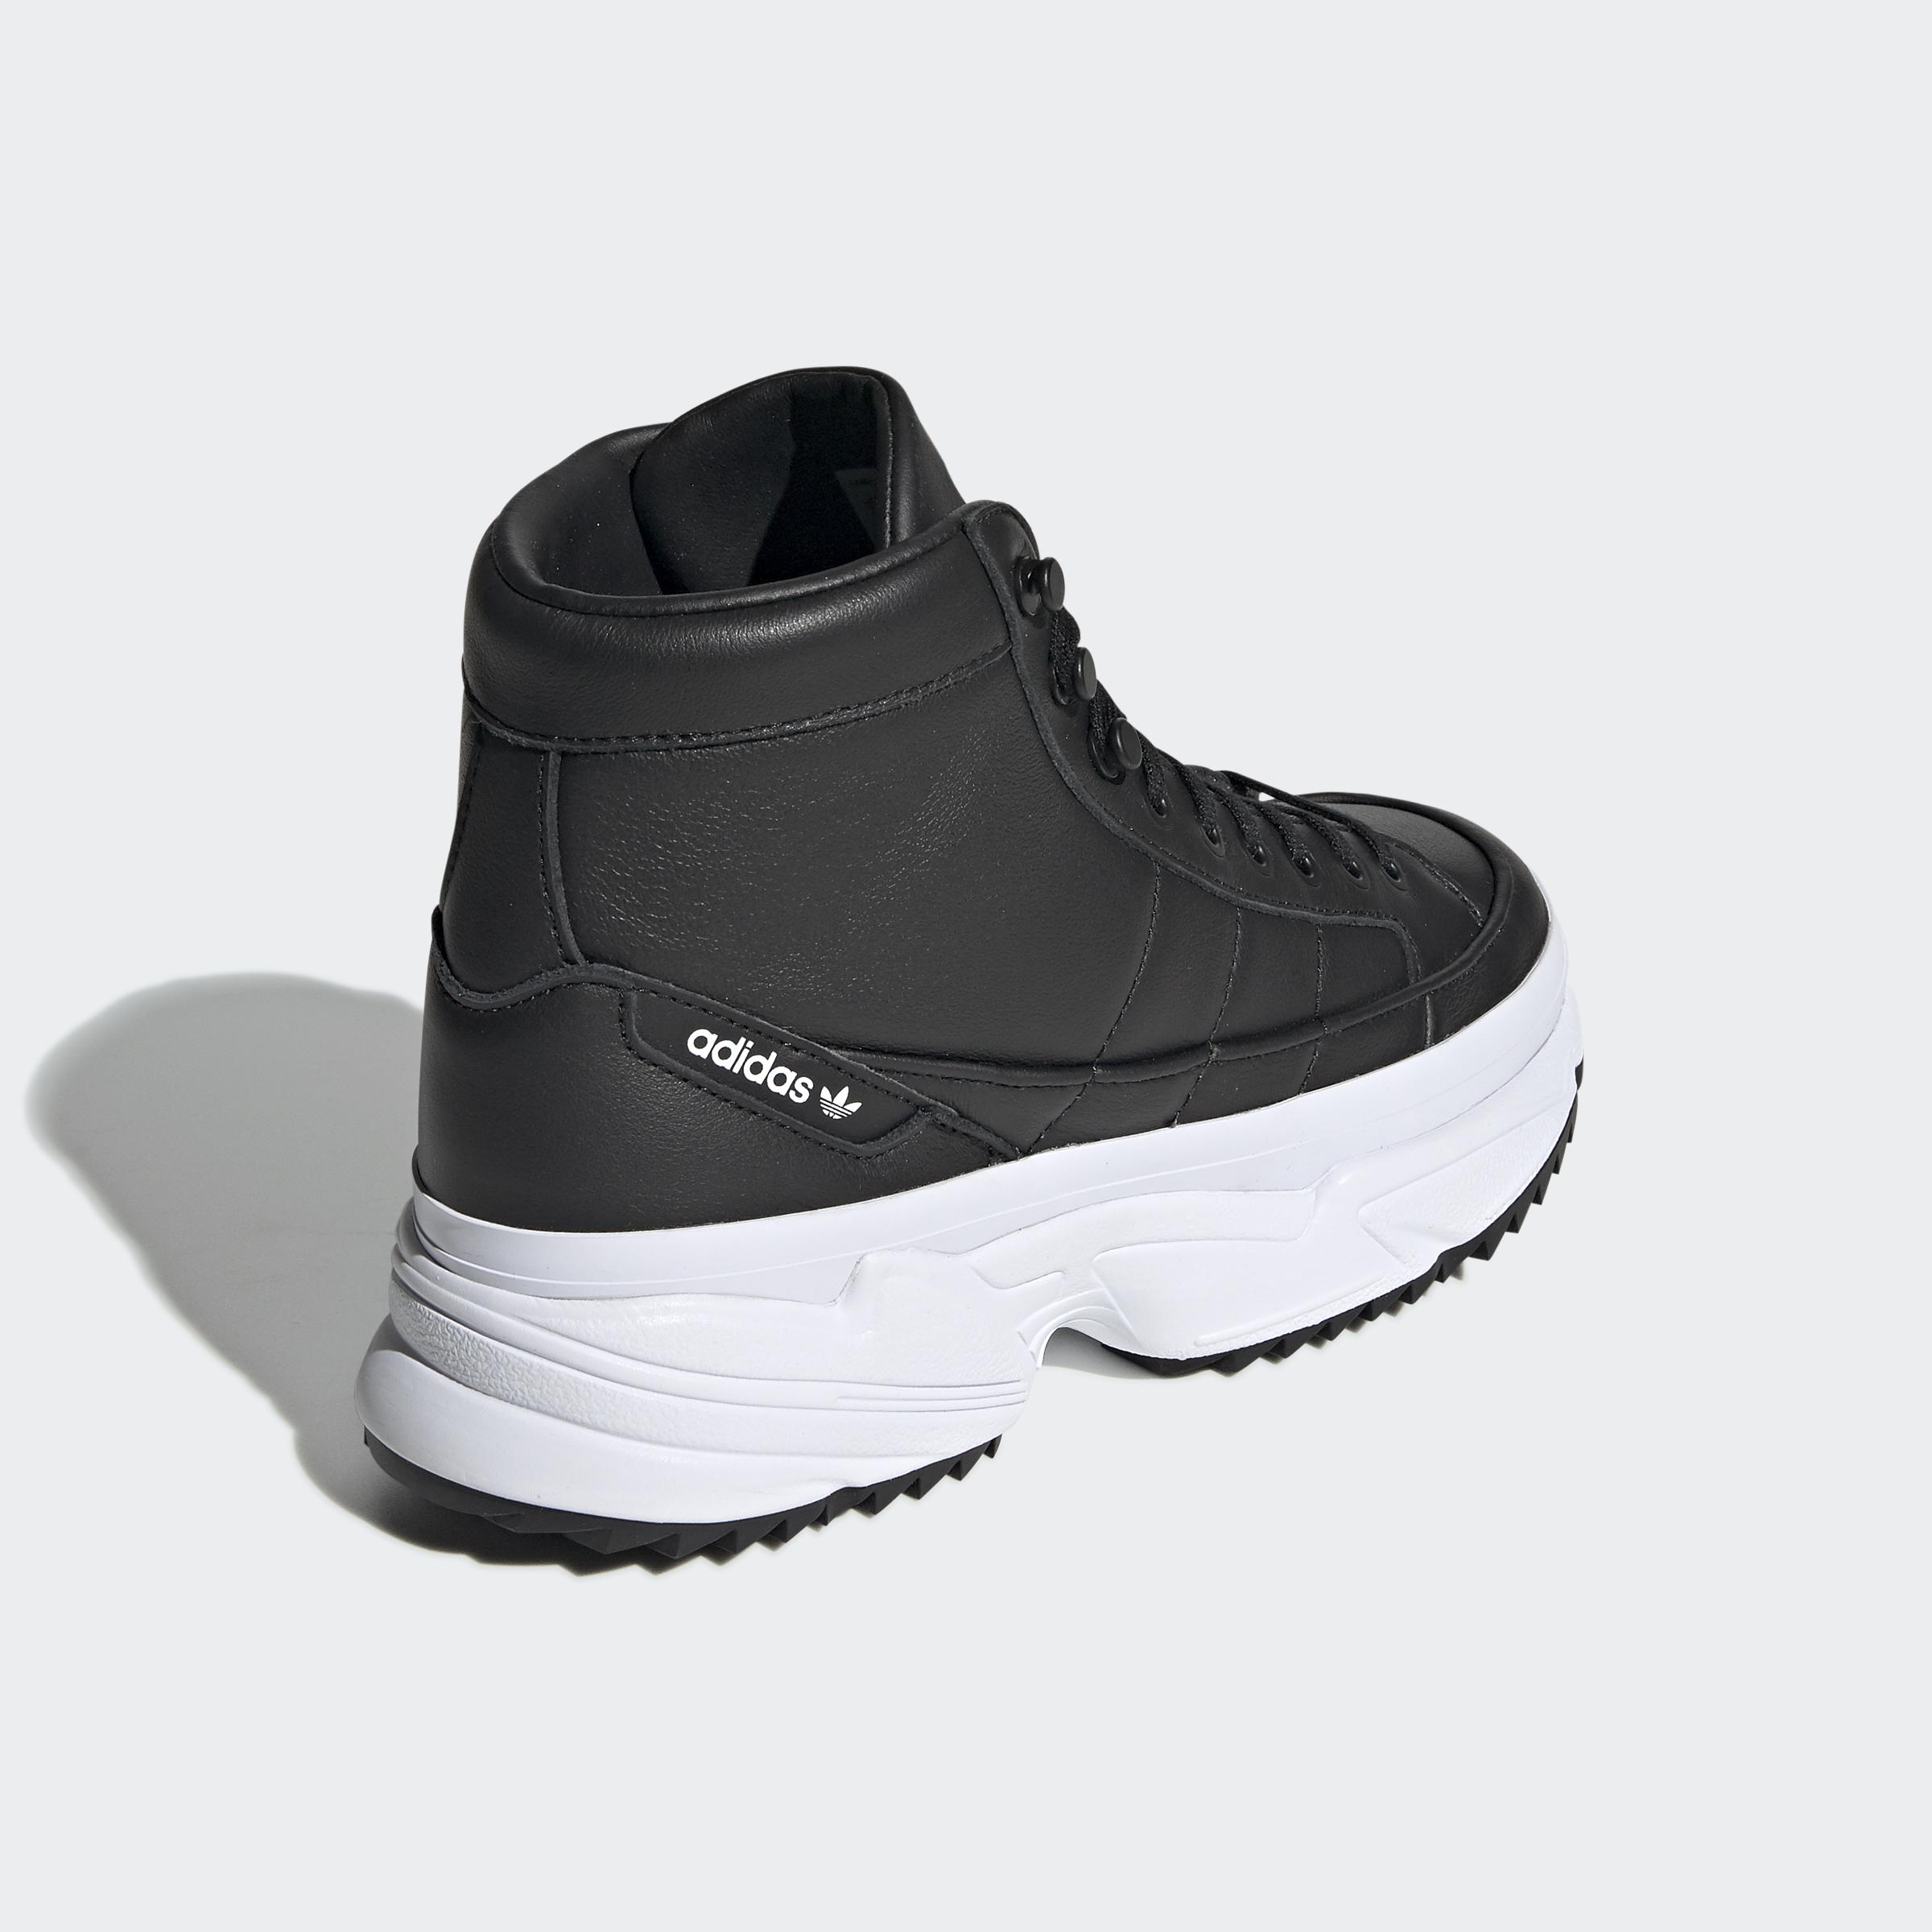 adidas-Kiellor-Xtra-Boots-Women-039-s-Boots thumbnail 11